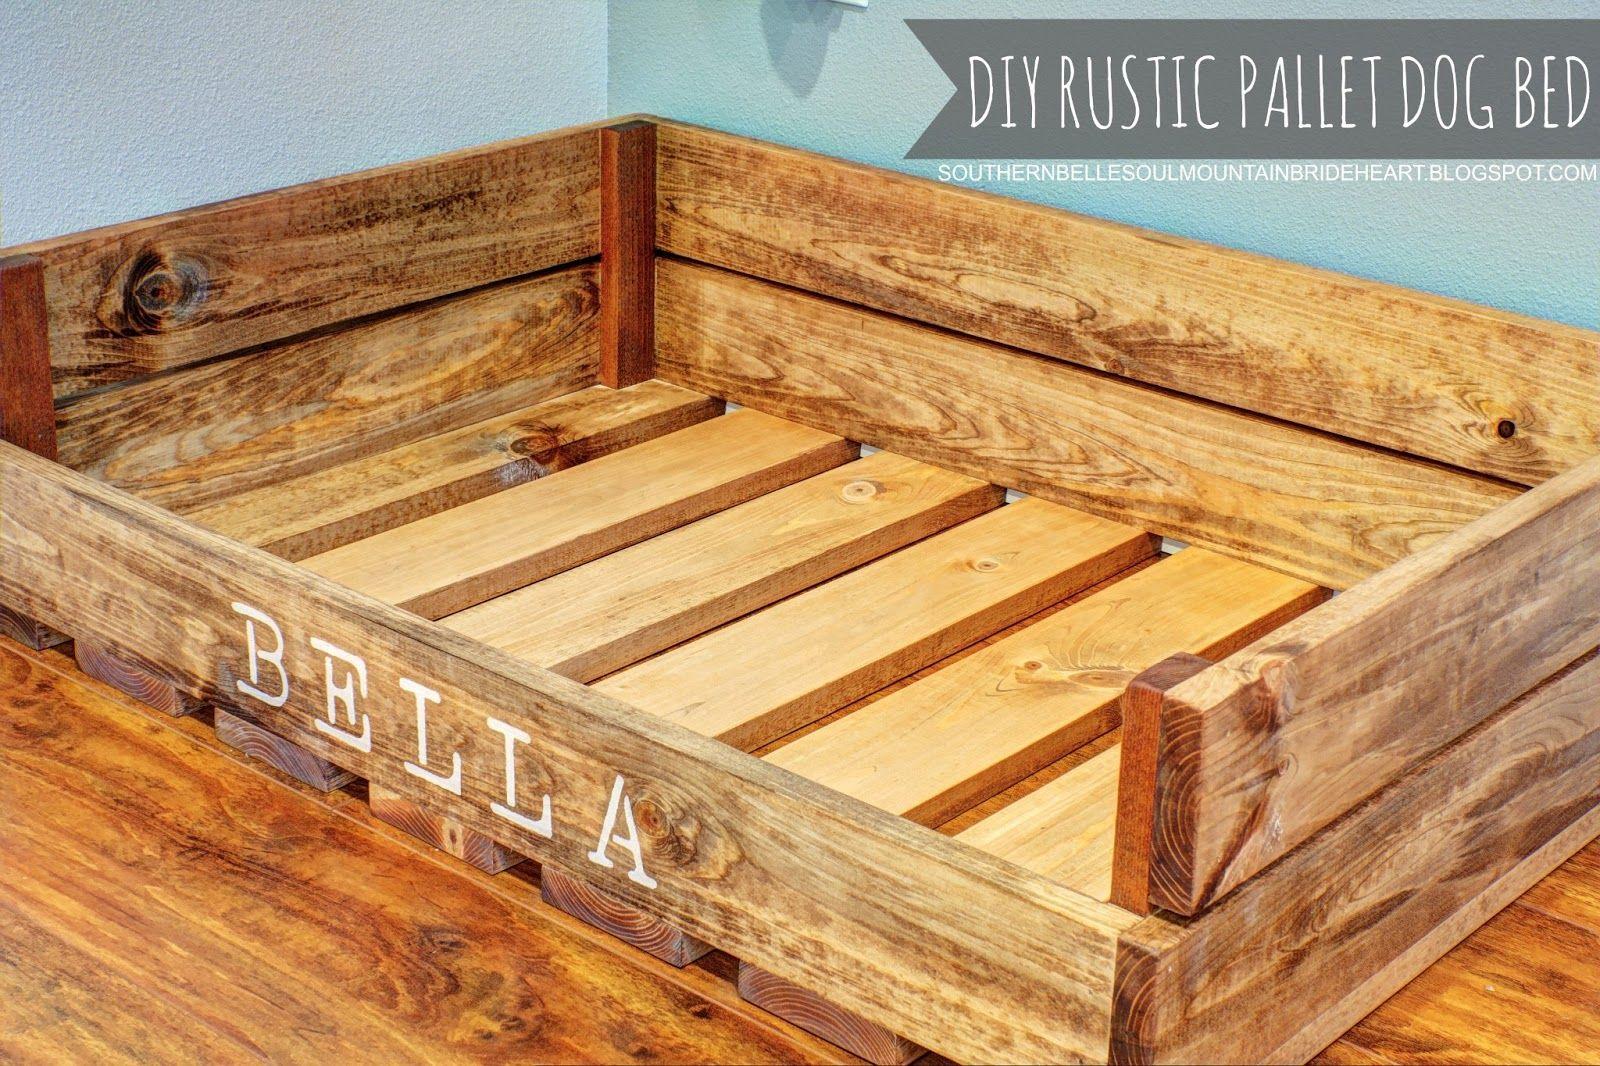 12 Unique DIY Dog Beds For Any Decor Pallet dog beds